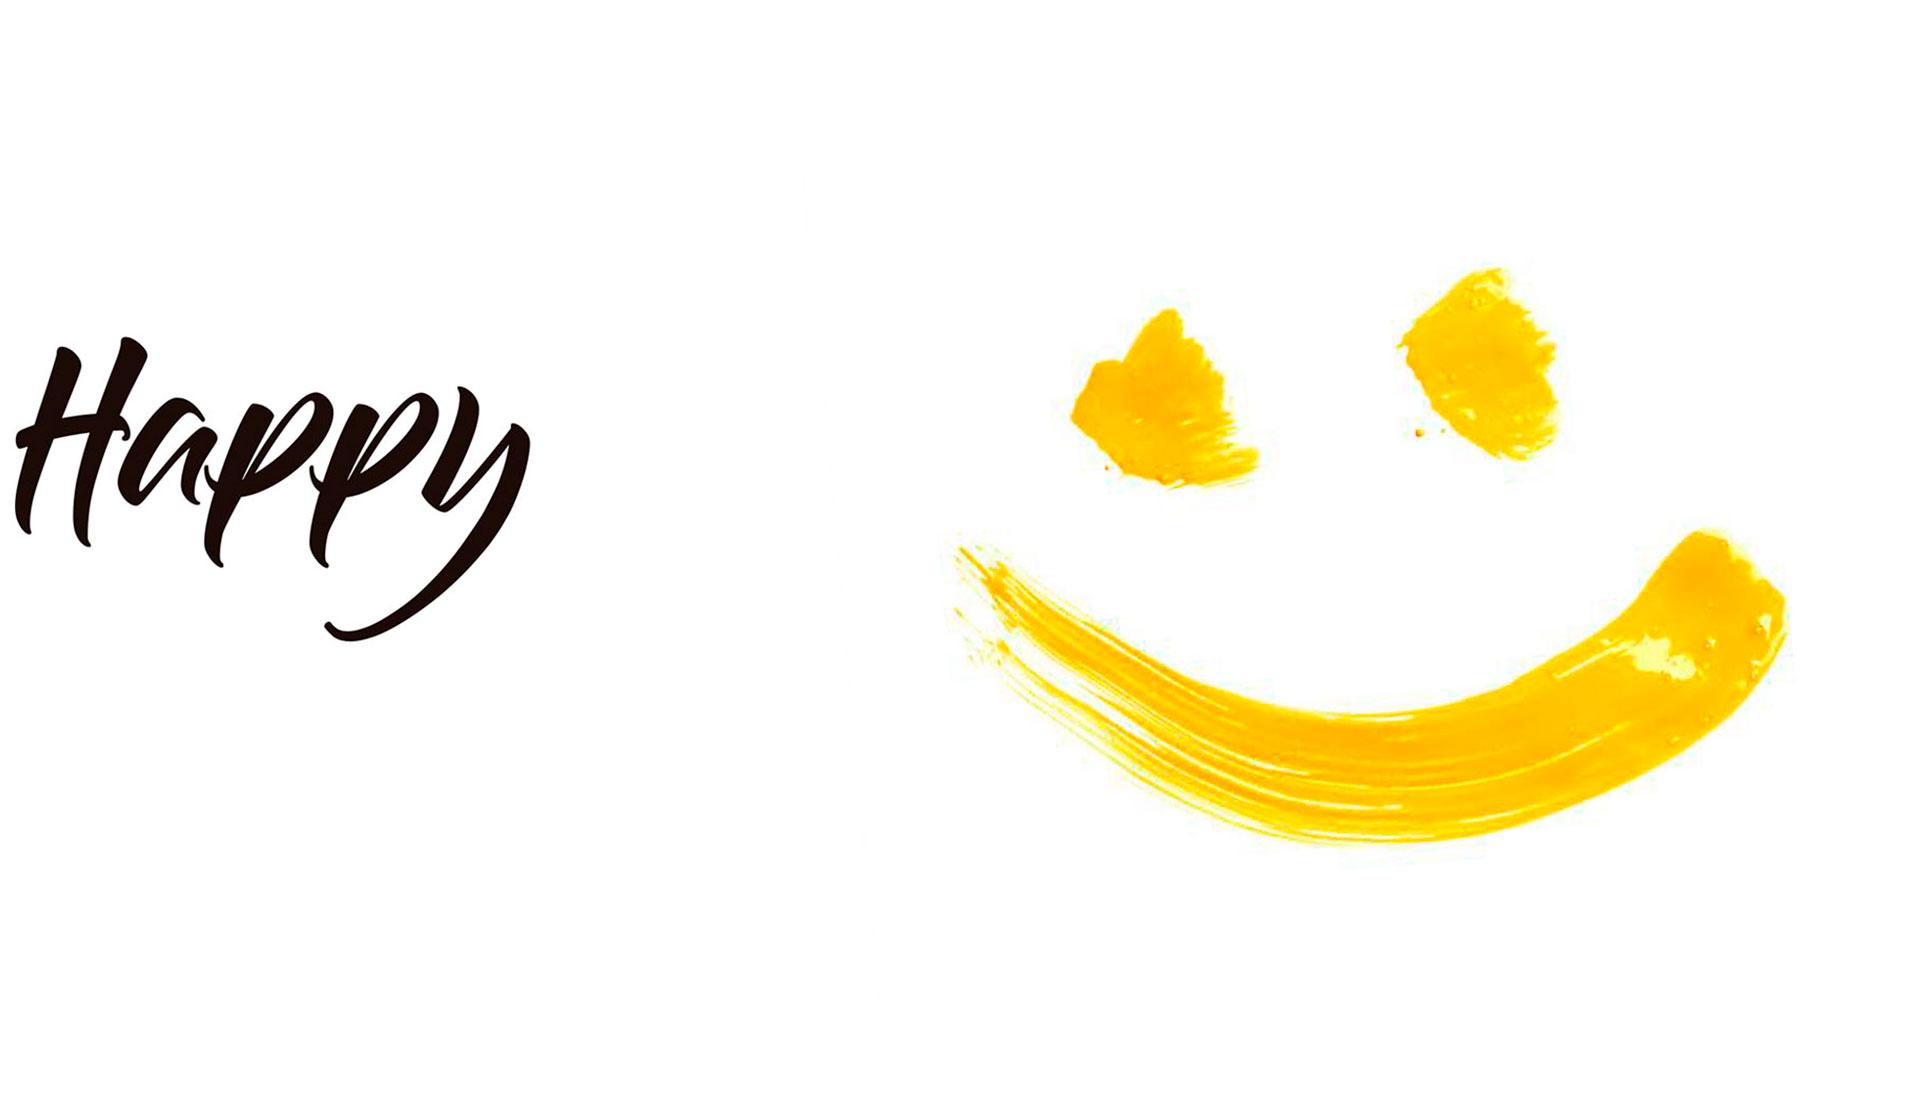 agencia-pennyworth-marketing-digital-identidad-corporativa-branding-restaurante-valencia-02